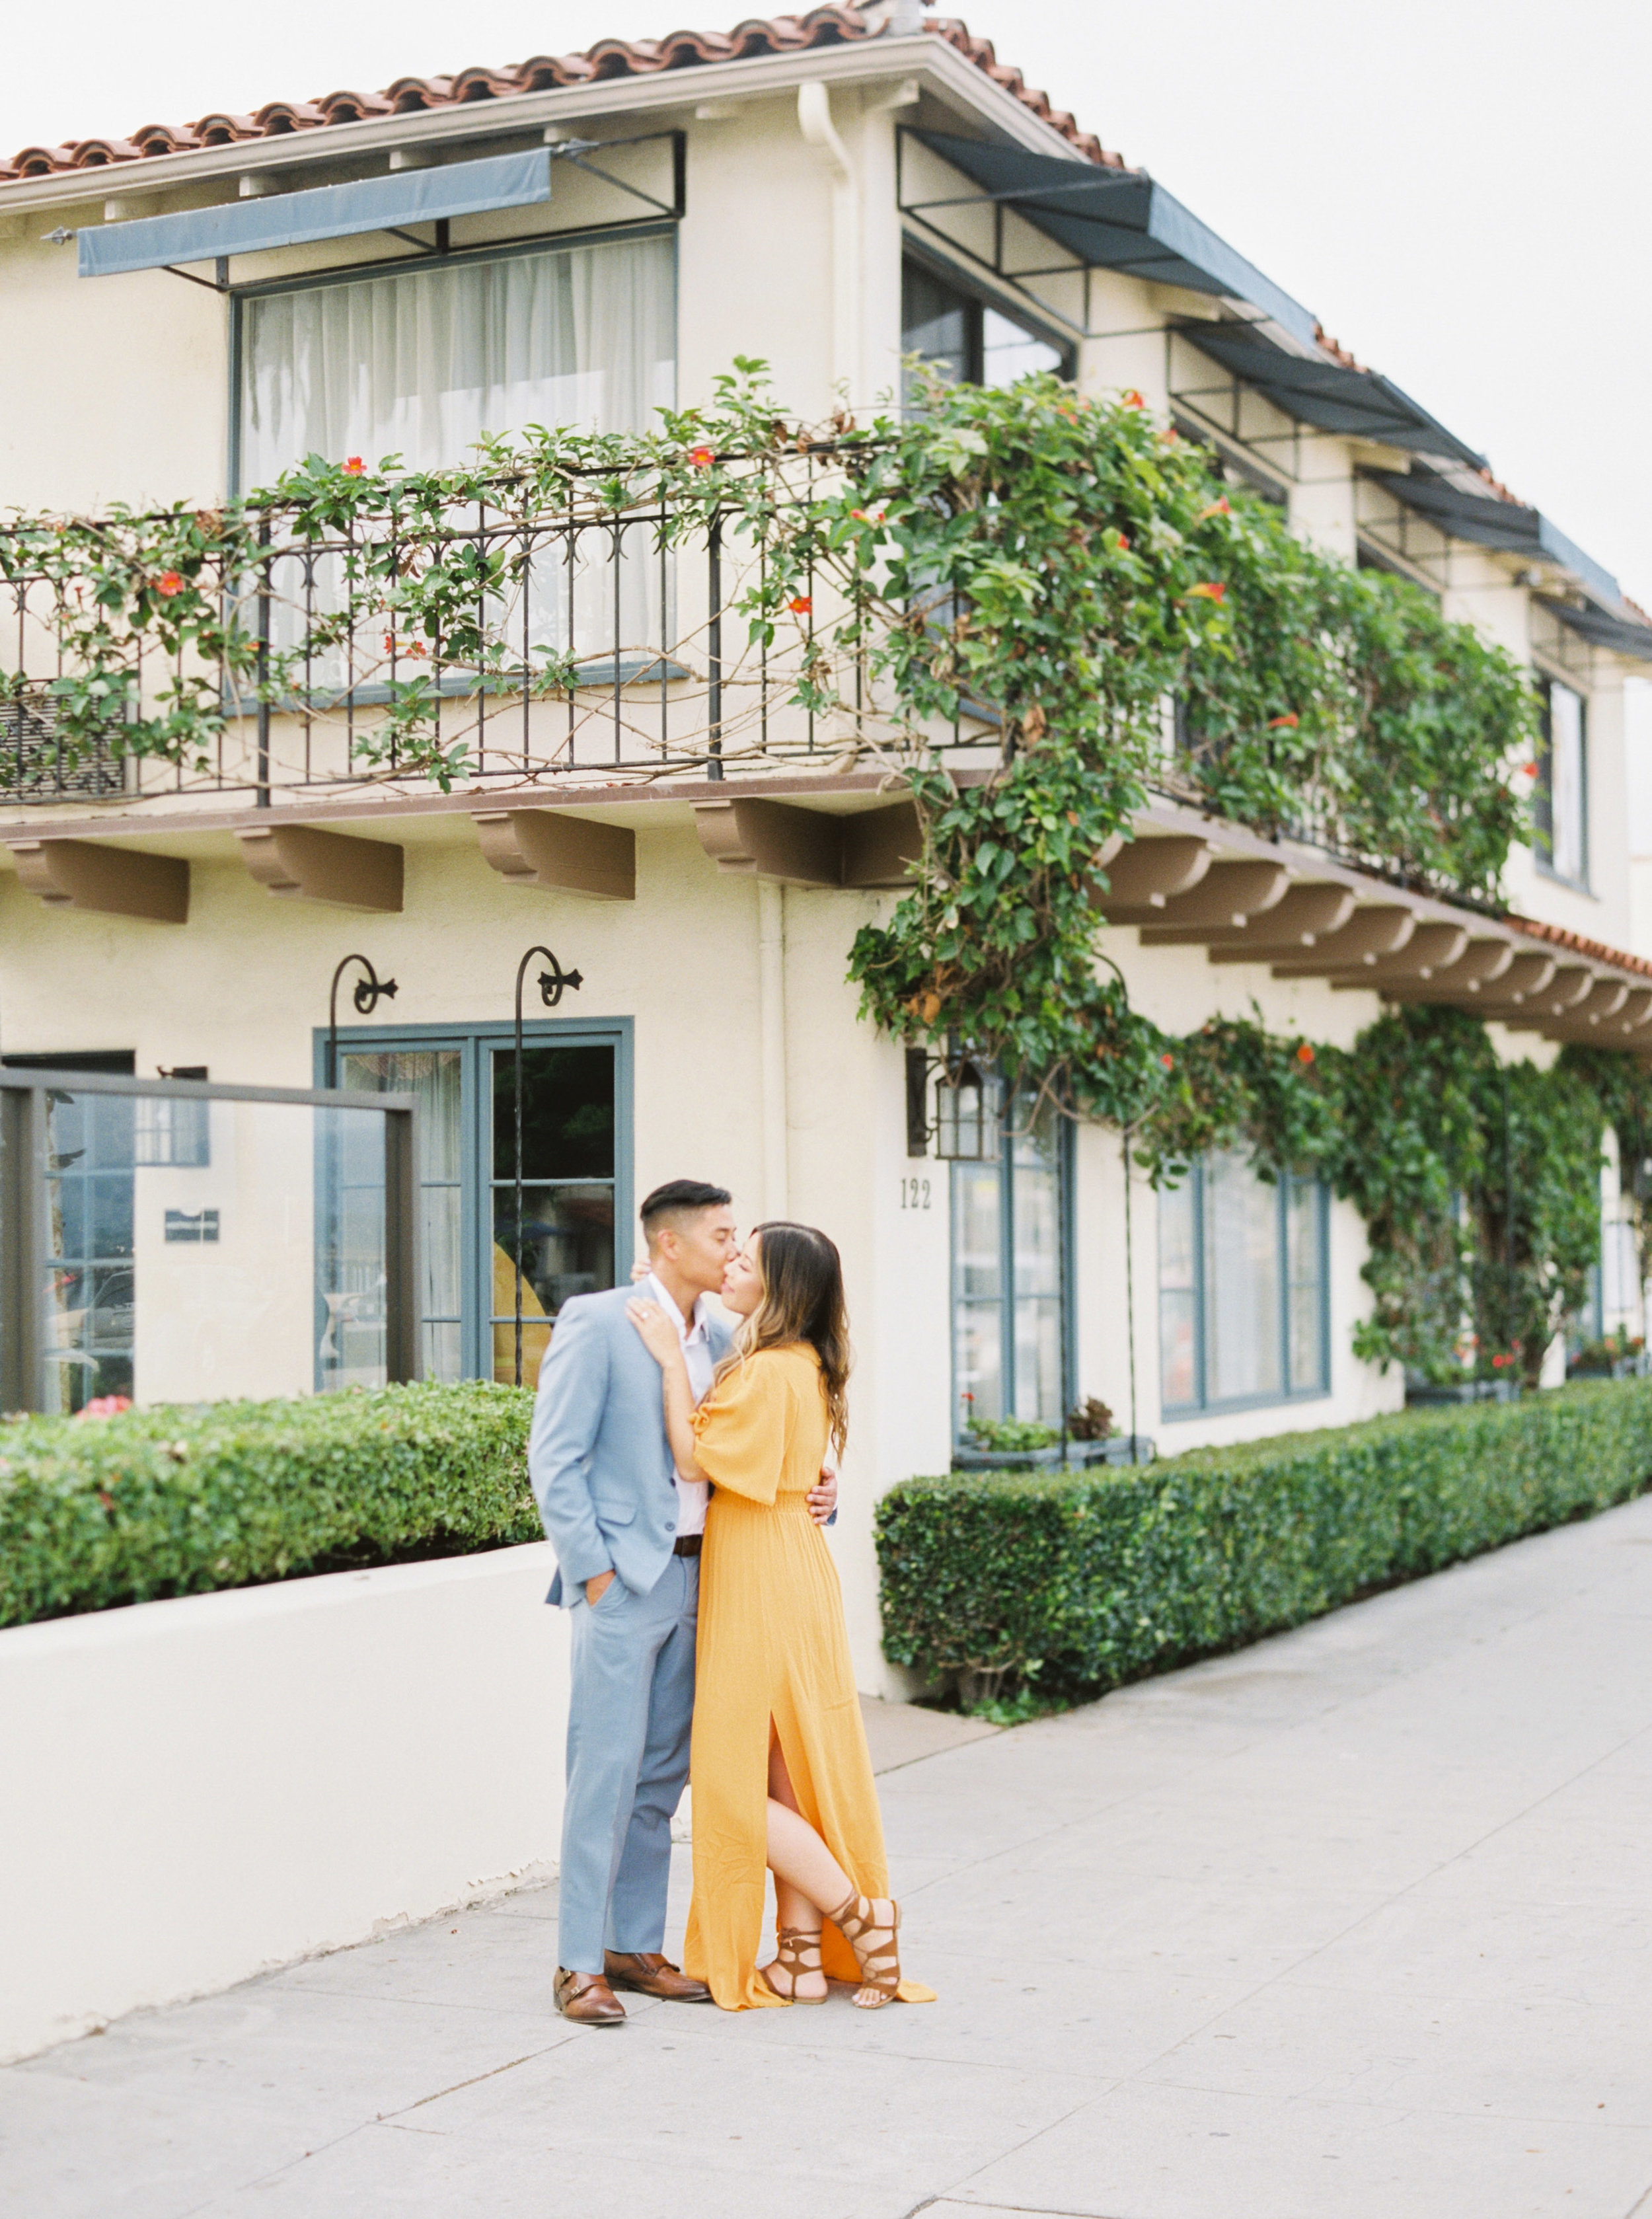 Santa Barbara California Fine Art Film Wedding Photographer Sheri McMahon-00126.jpg